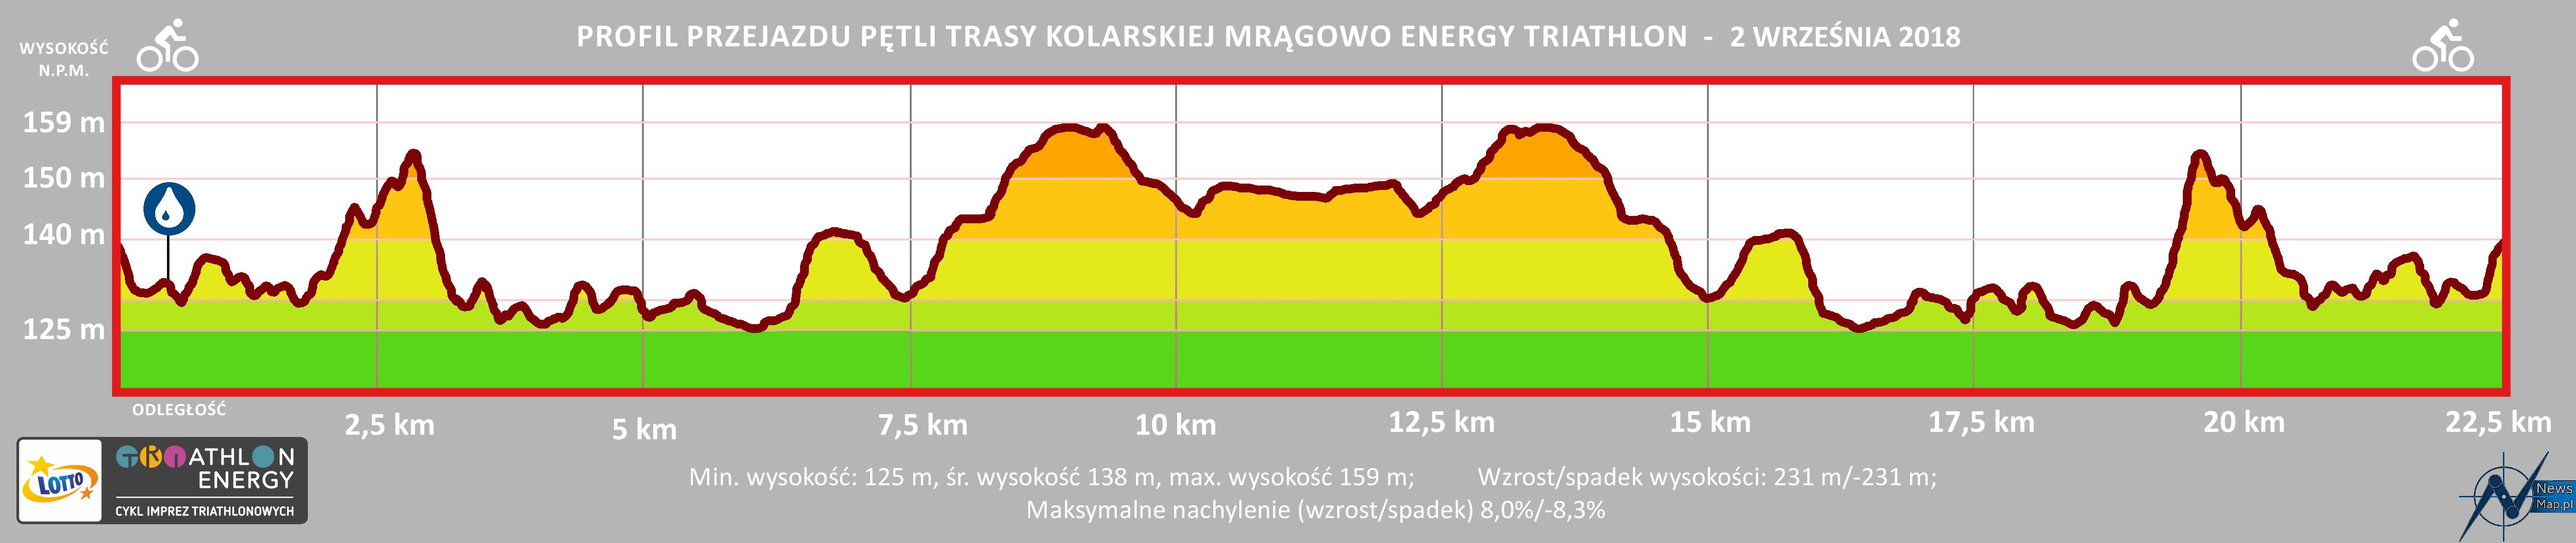 energy mrągowo profil rower